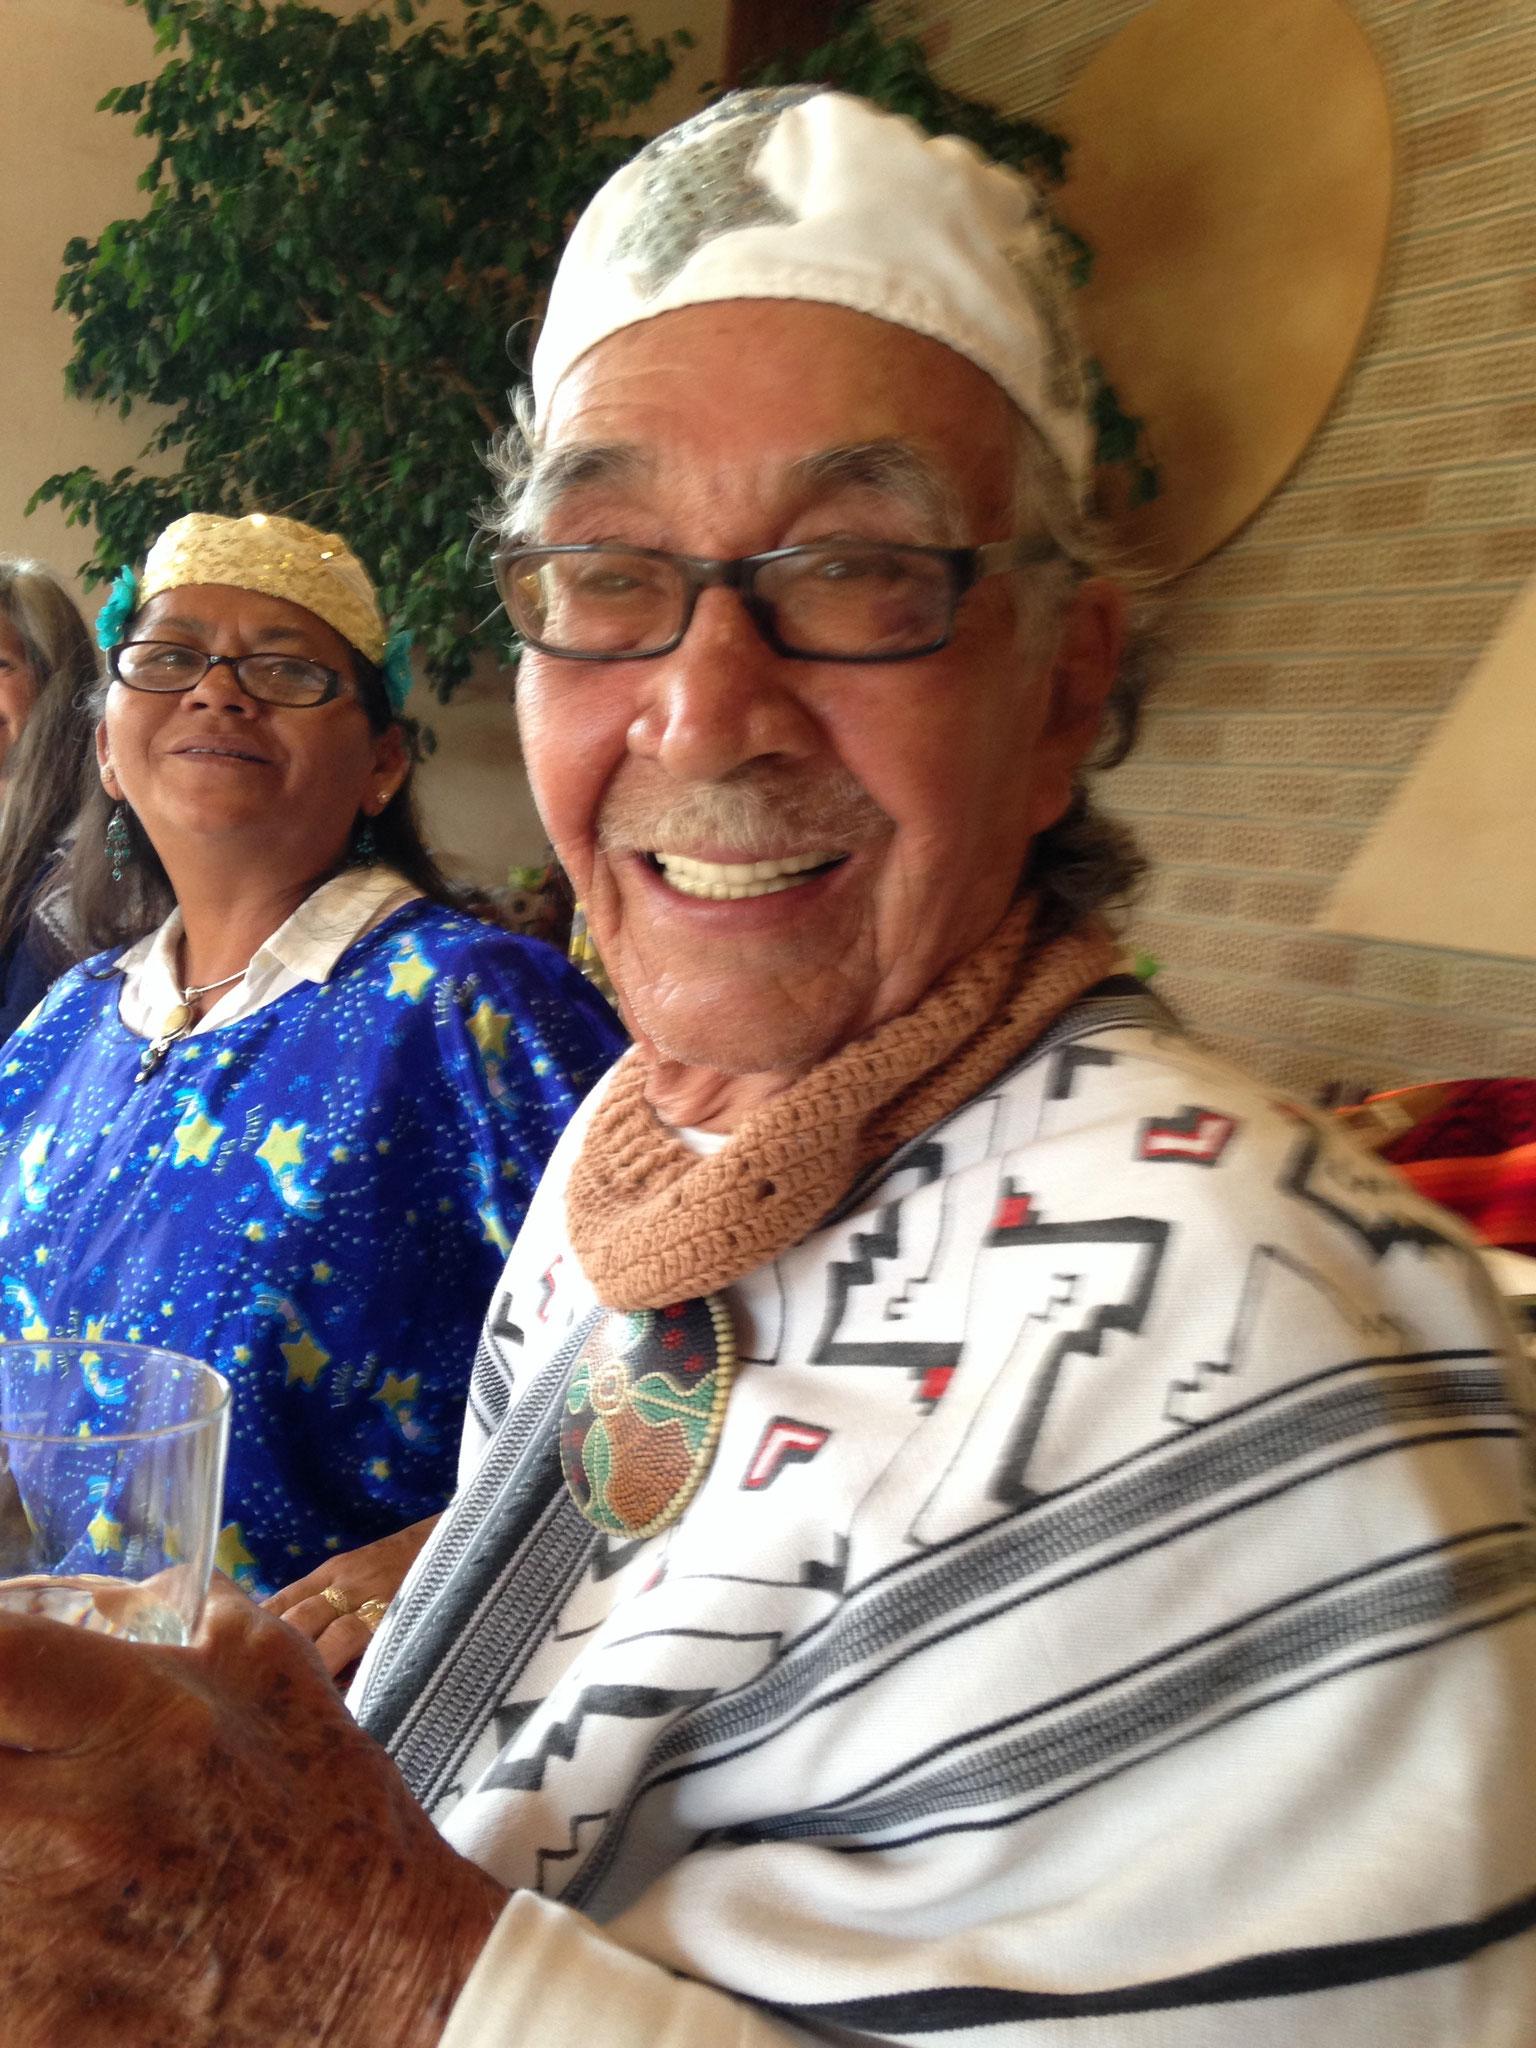 Don Agustin Rivas Vasquez & Dona Marlene Soto Ramirez